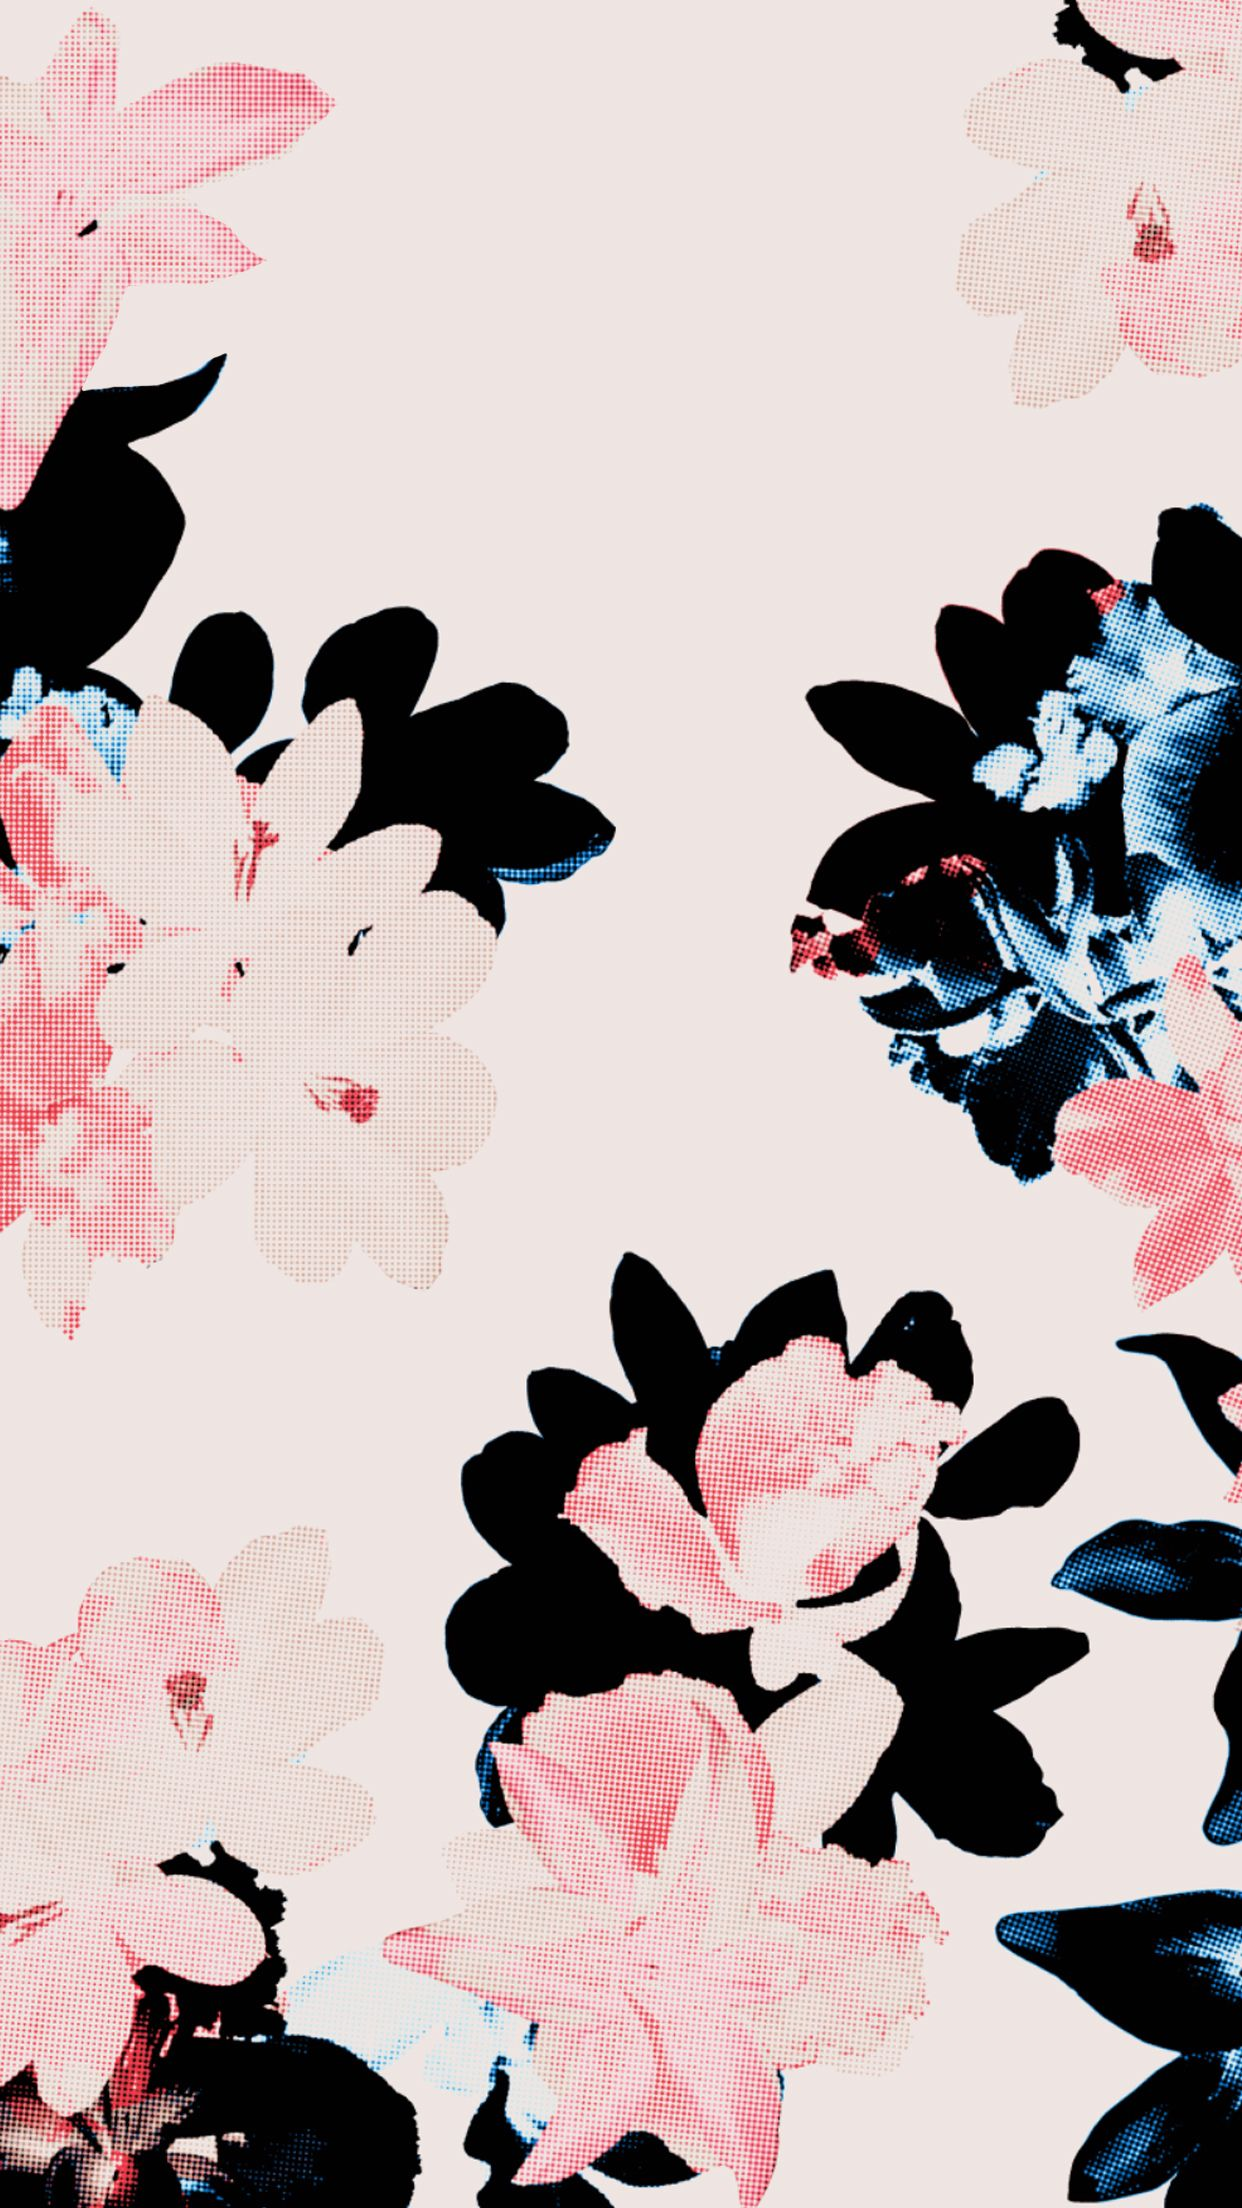 Pinterest//AugustKunce | Wallpapers | Iphone wallpaper, Wallpaper, Iphone